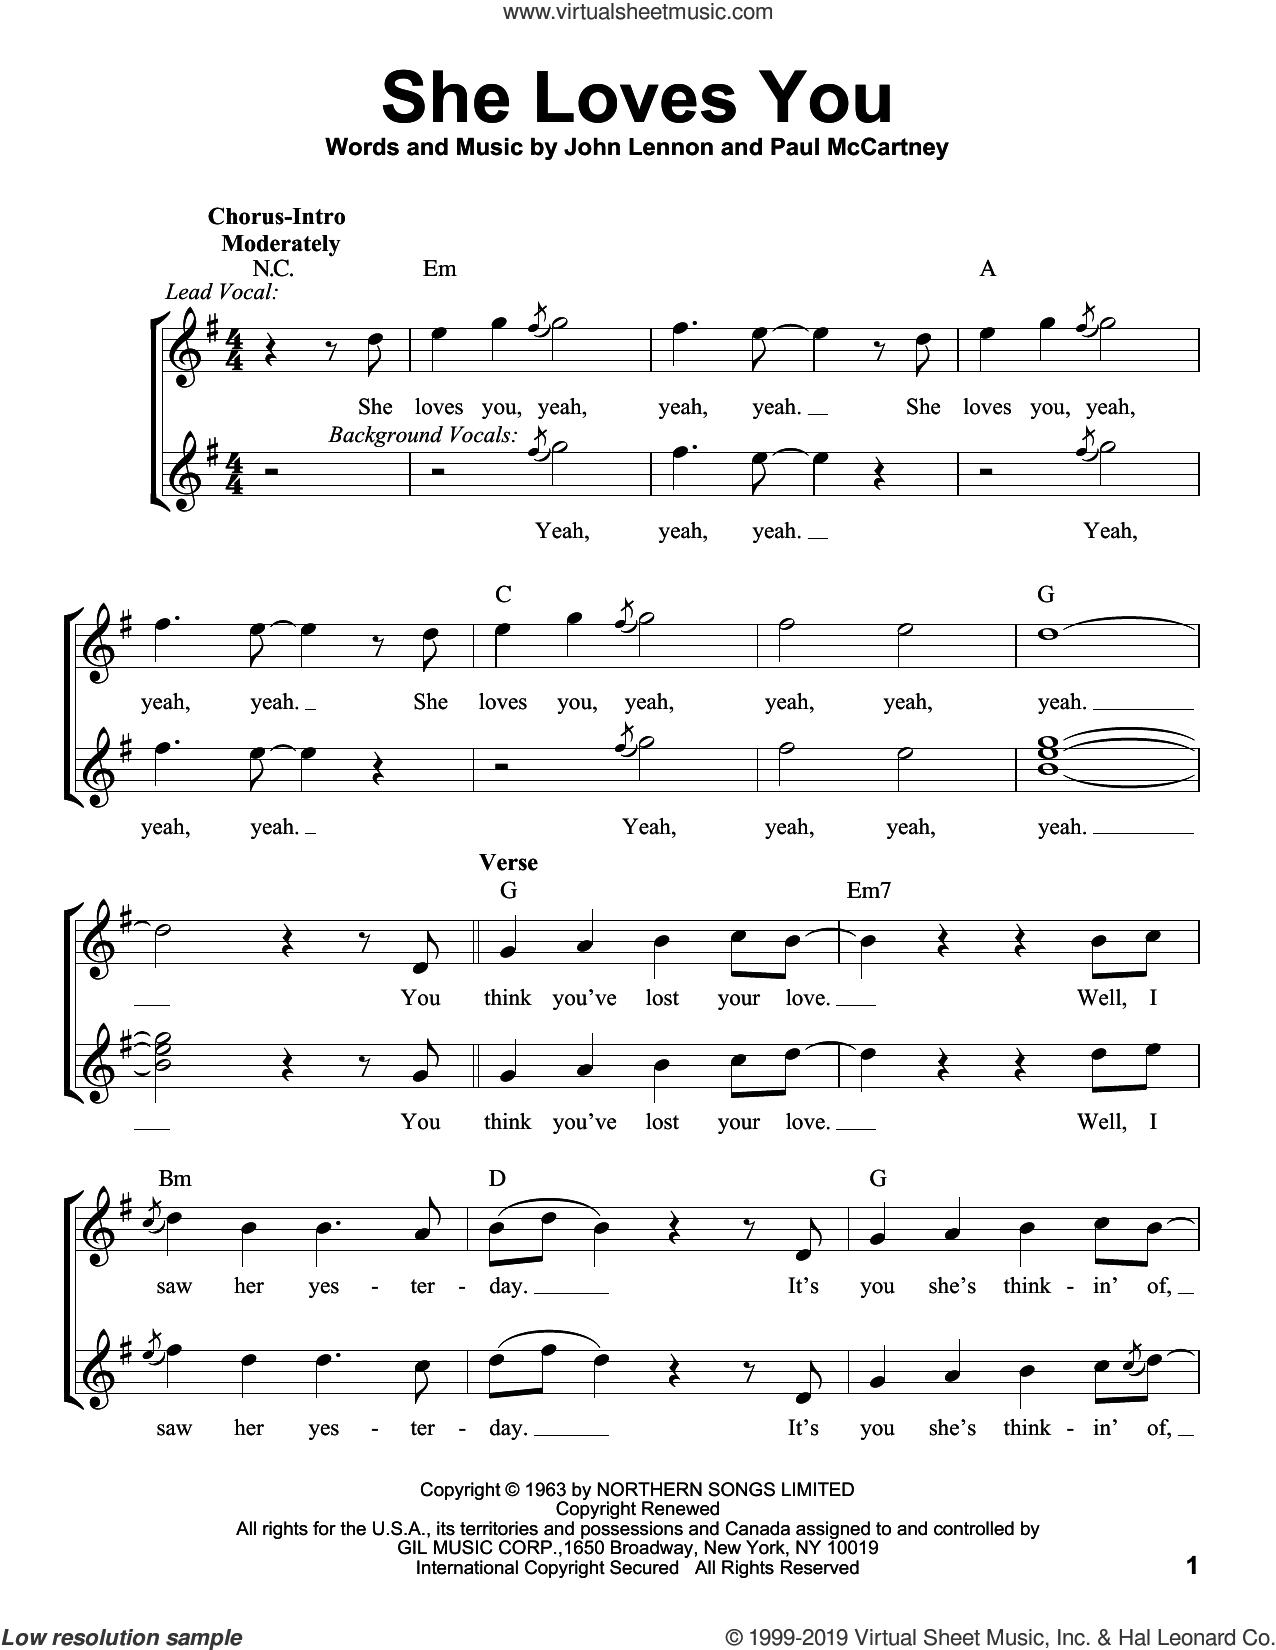 She Loves You sheet music for voice solo by The Beatles, John Lennon and Paul McCartney, intermediate skill level